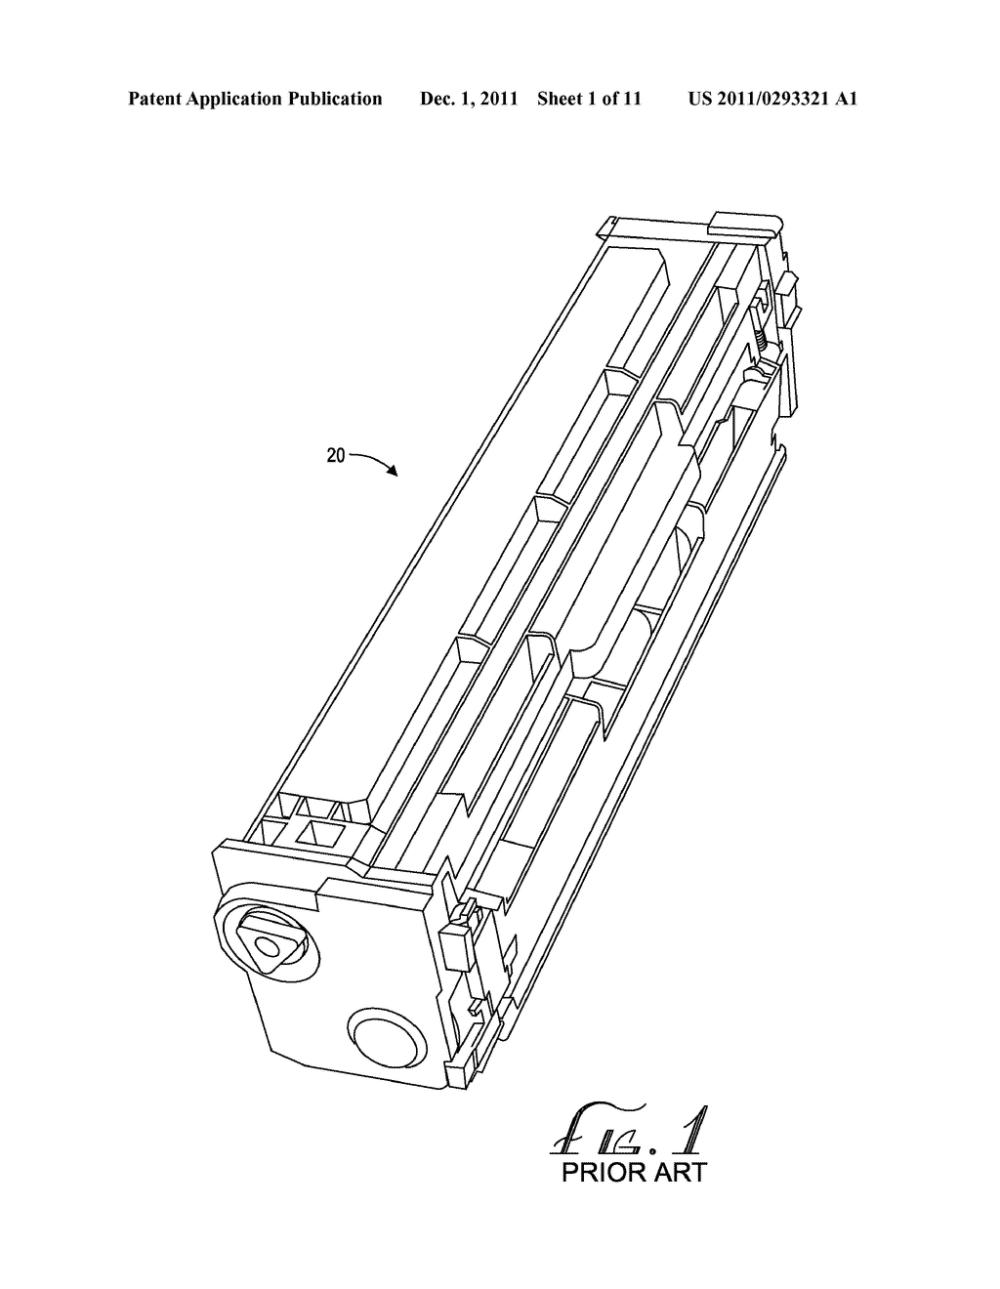 medium resolution of laser printer cartridge with increased toner storage capacity diagram schematic and image 02